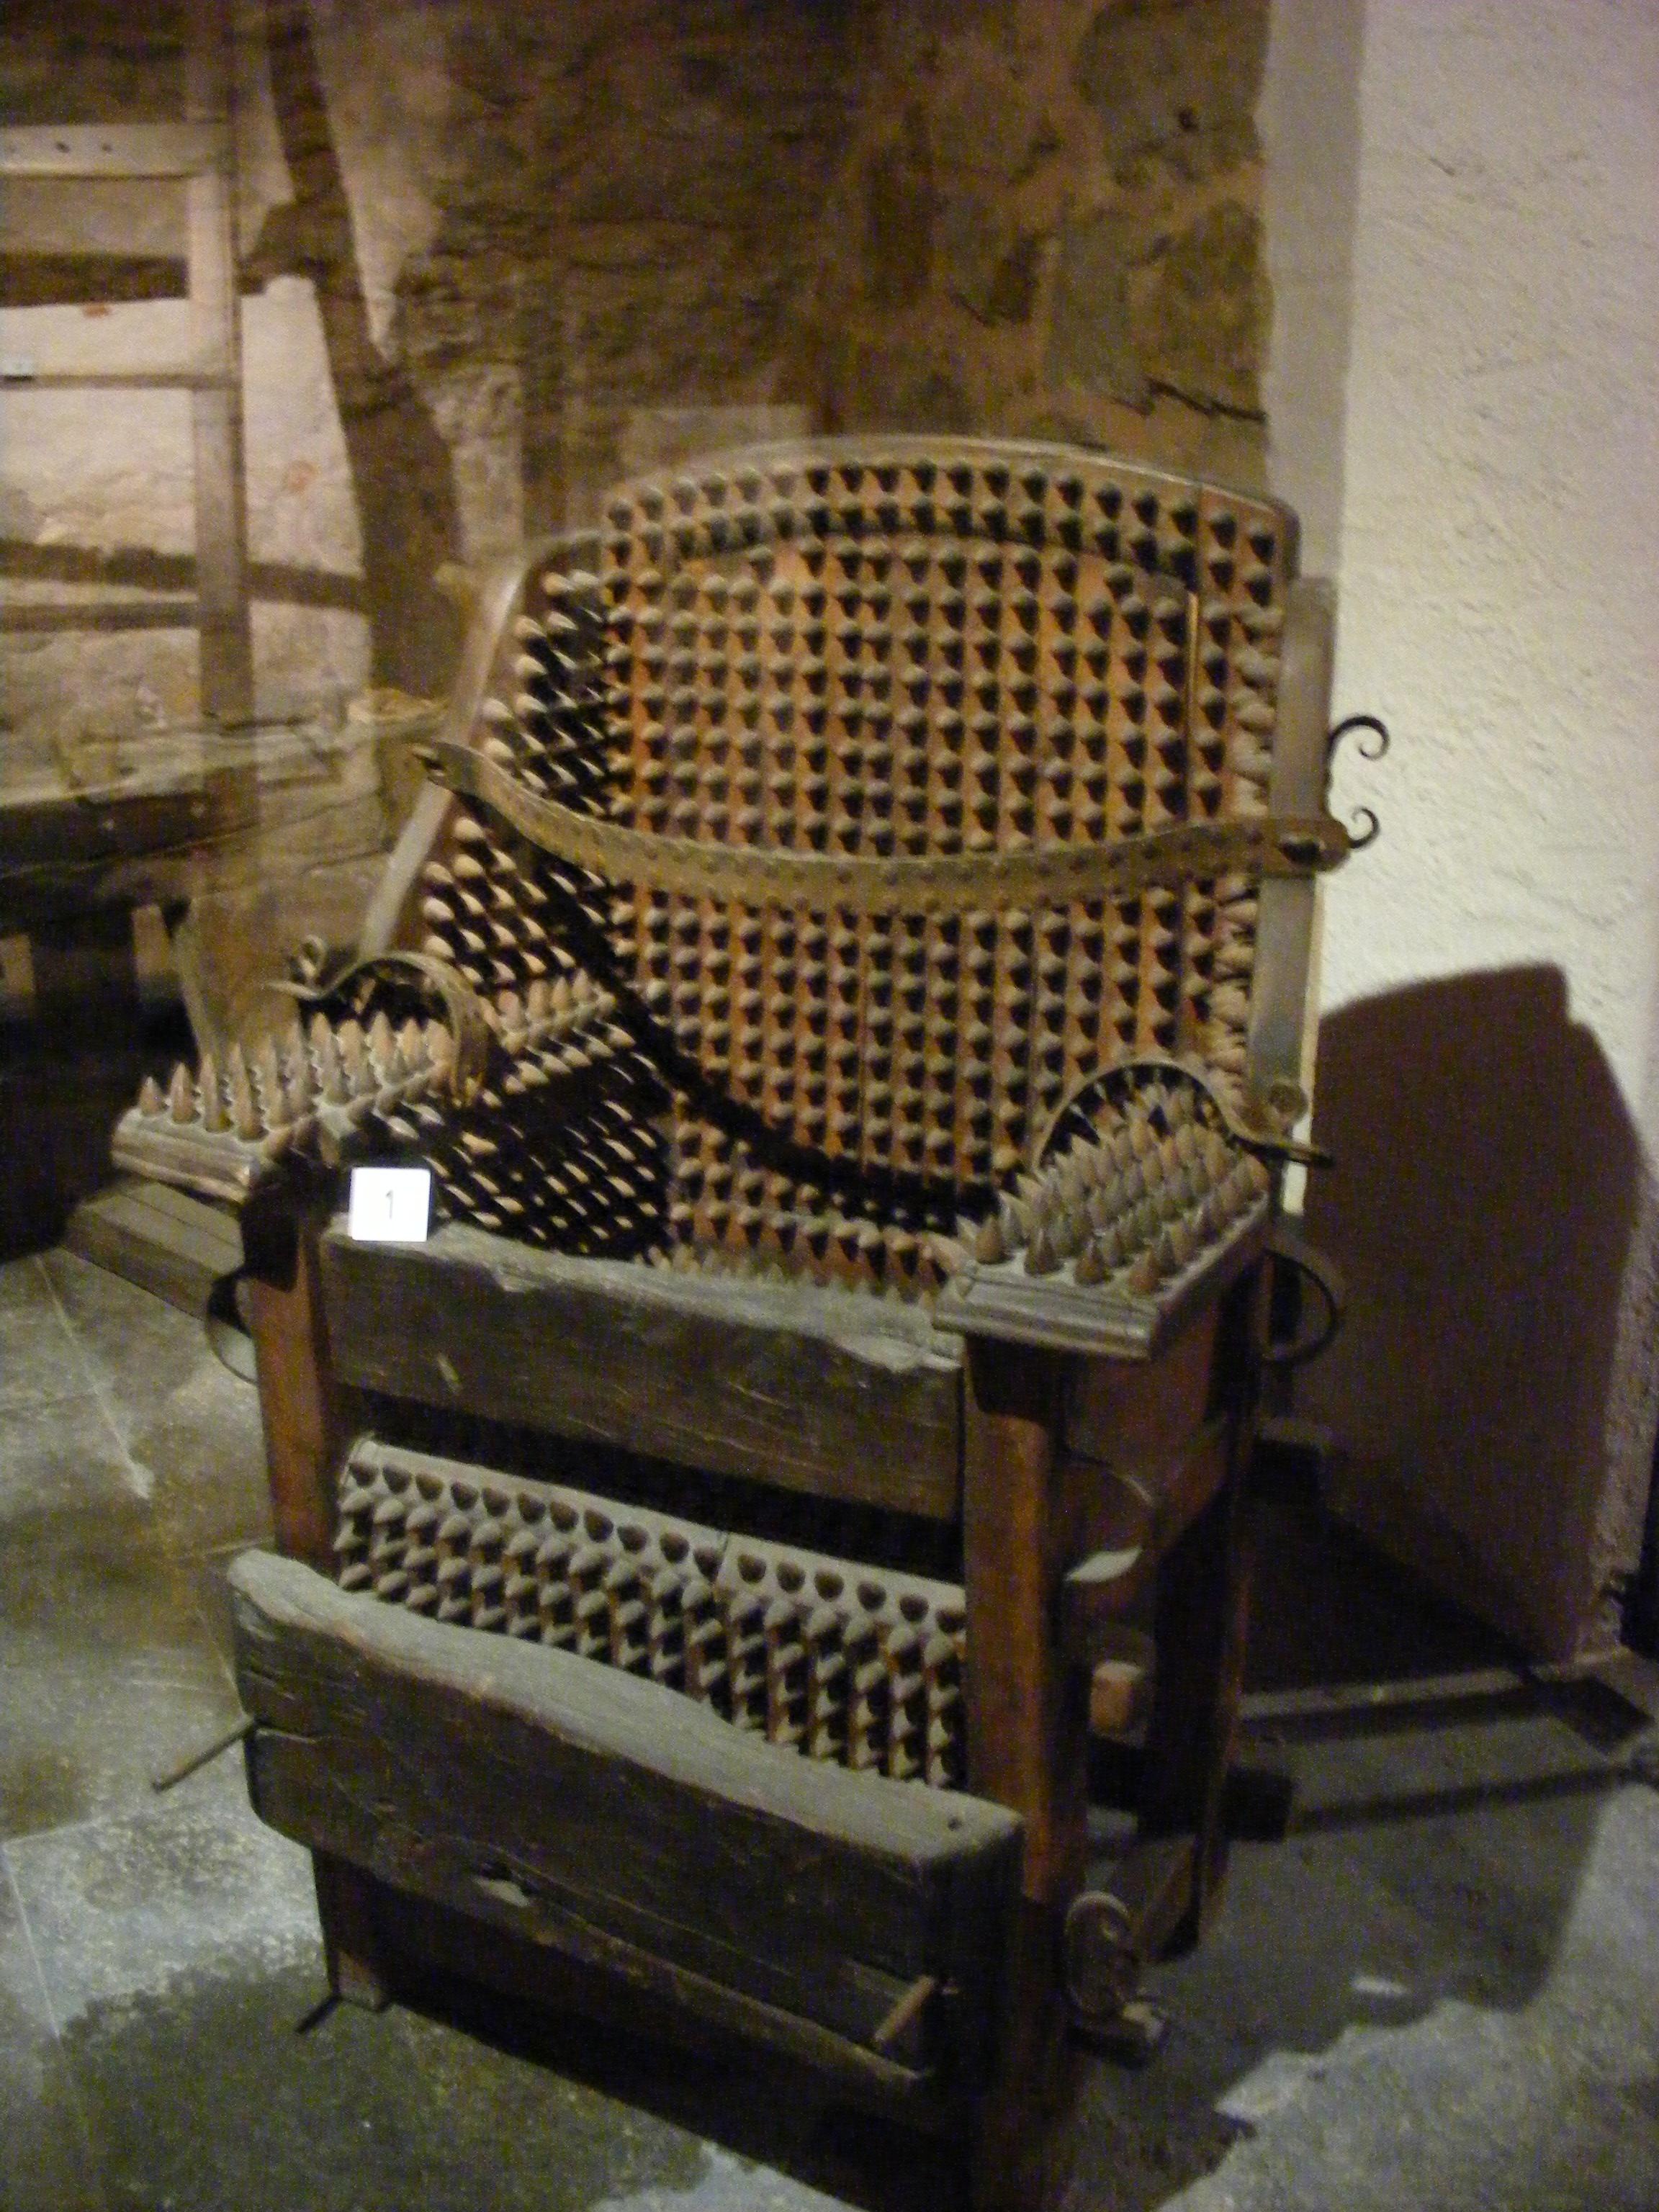 Milf medieval torture chair erotica scenes